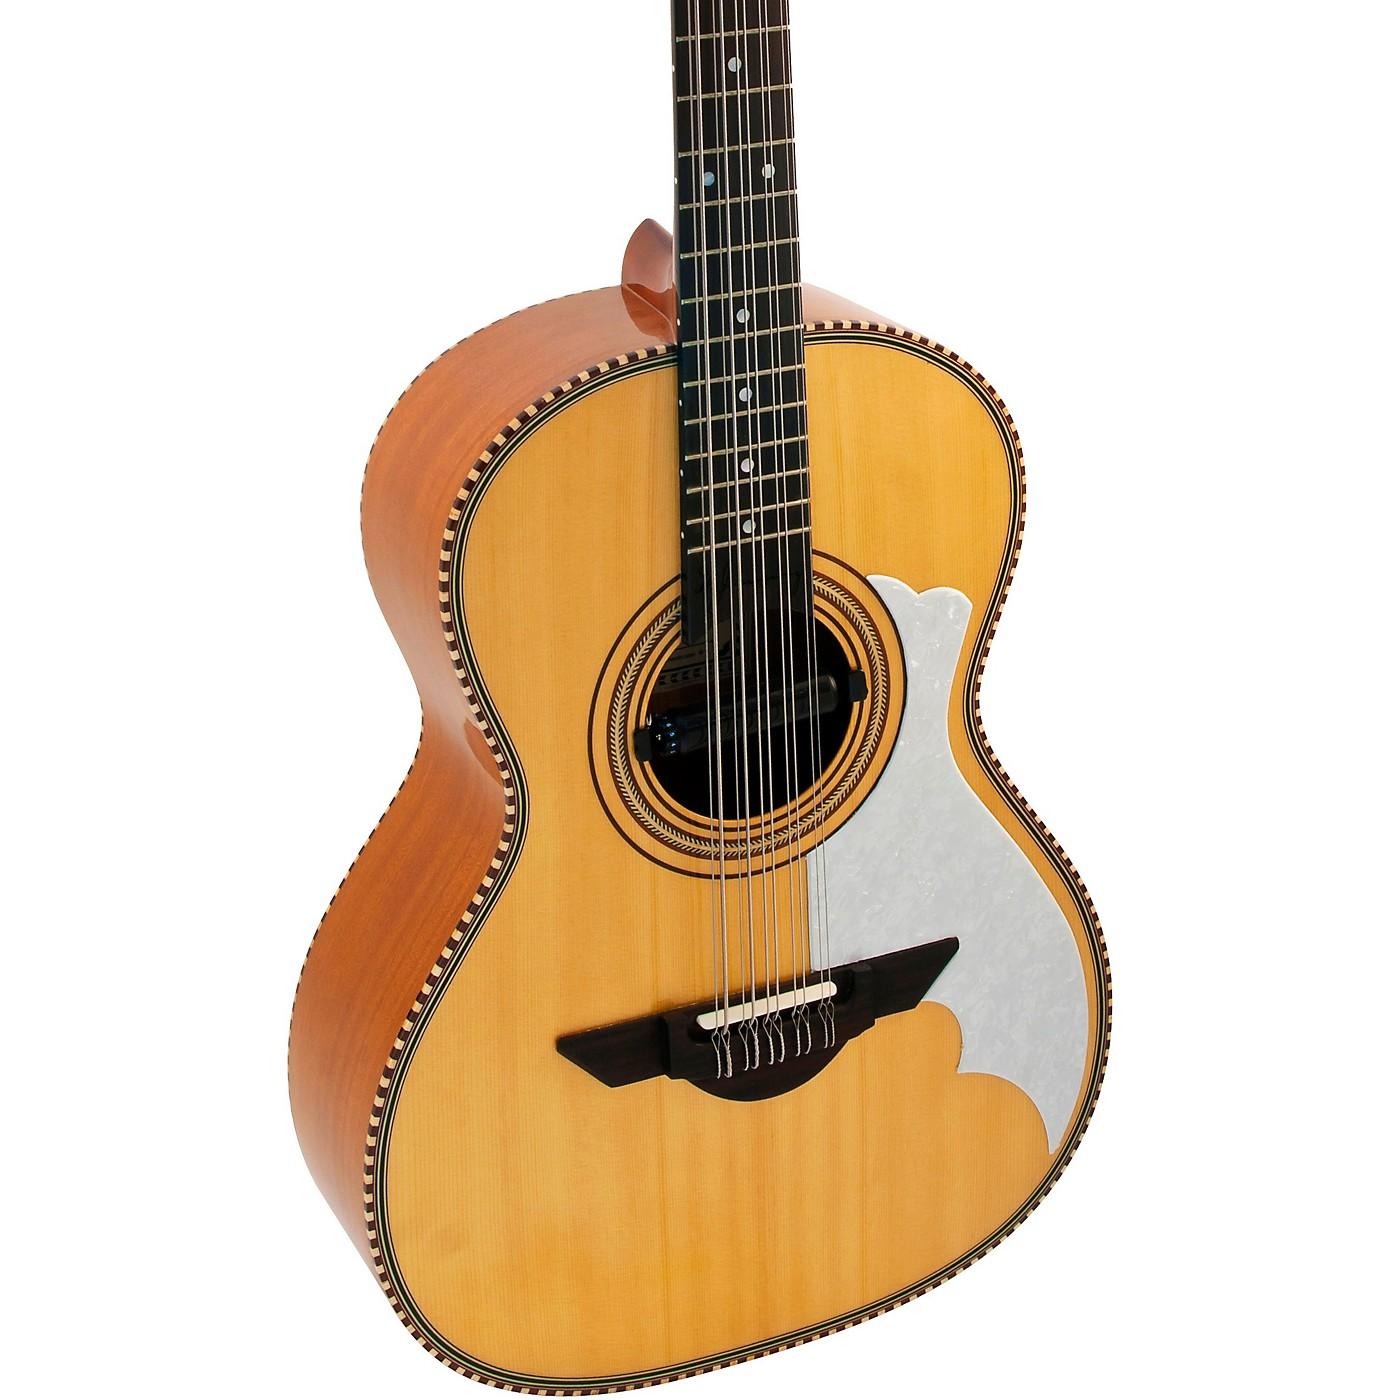 H. Jimenez LBQ2NCE Bajo Quinto El Musico Series Non-Cutaway Acoustic-Electric thumbnail